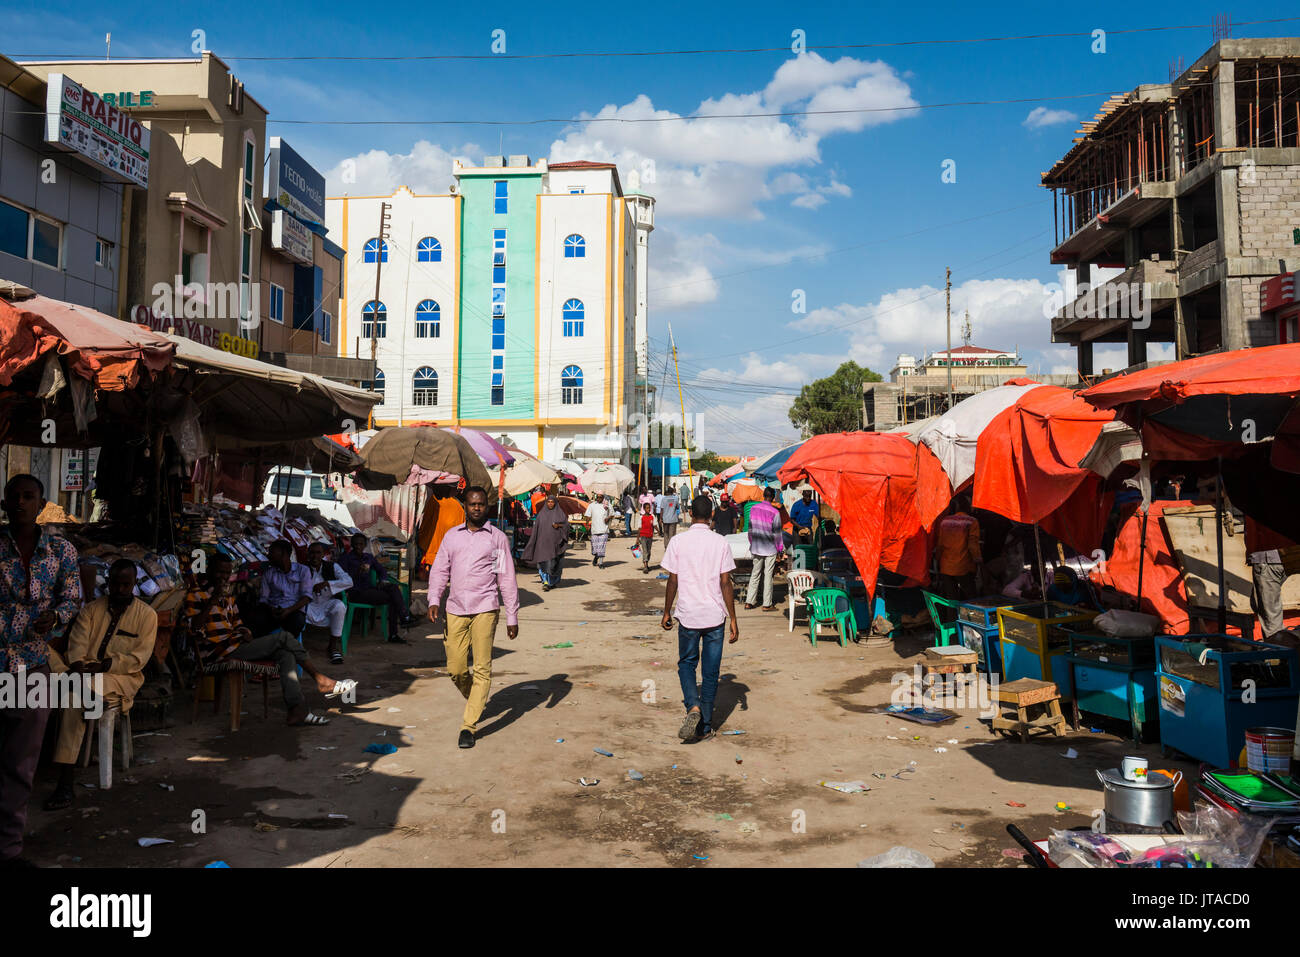 Dusty street in Hargeisa, Somaliland, Somalia, Africa - Stock Image